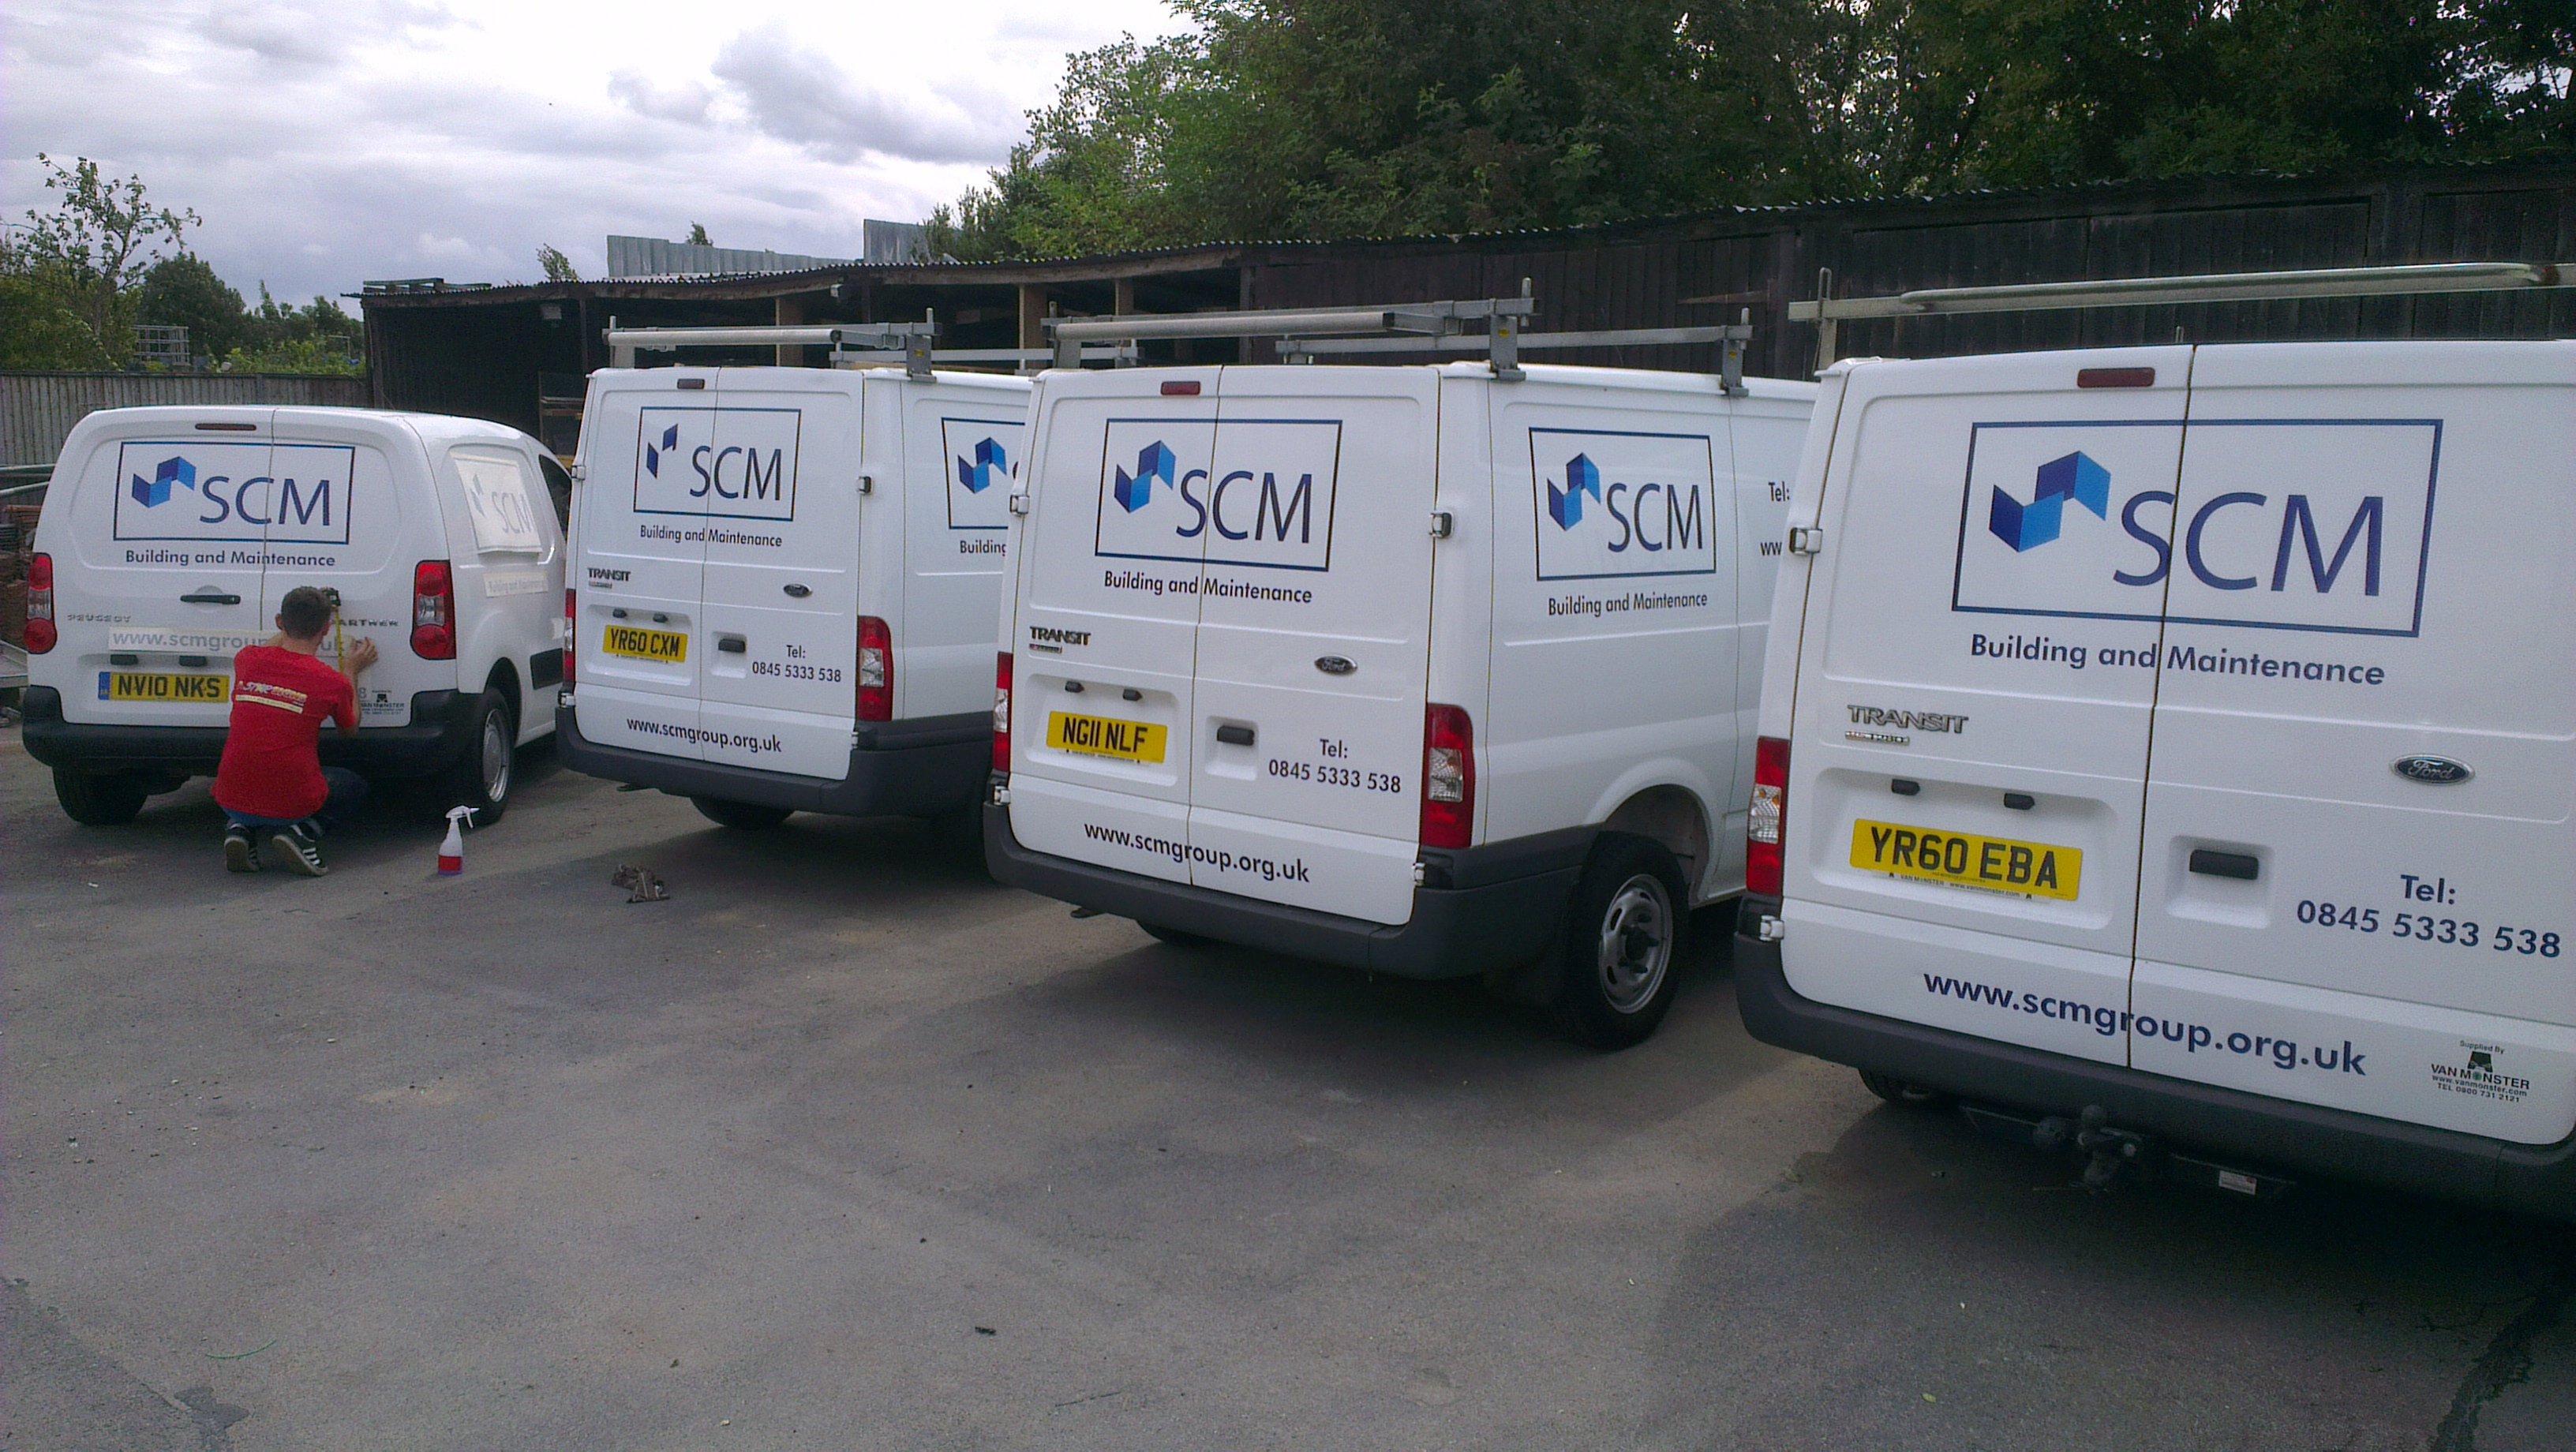 SCM rear view of the van